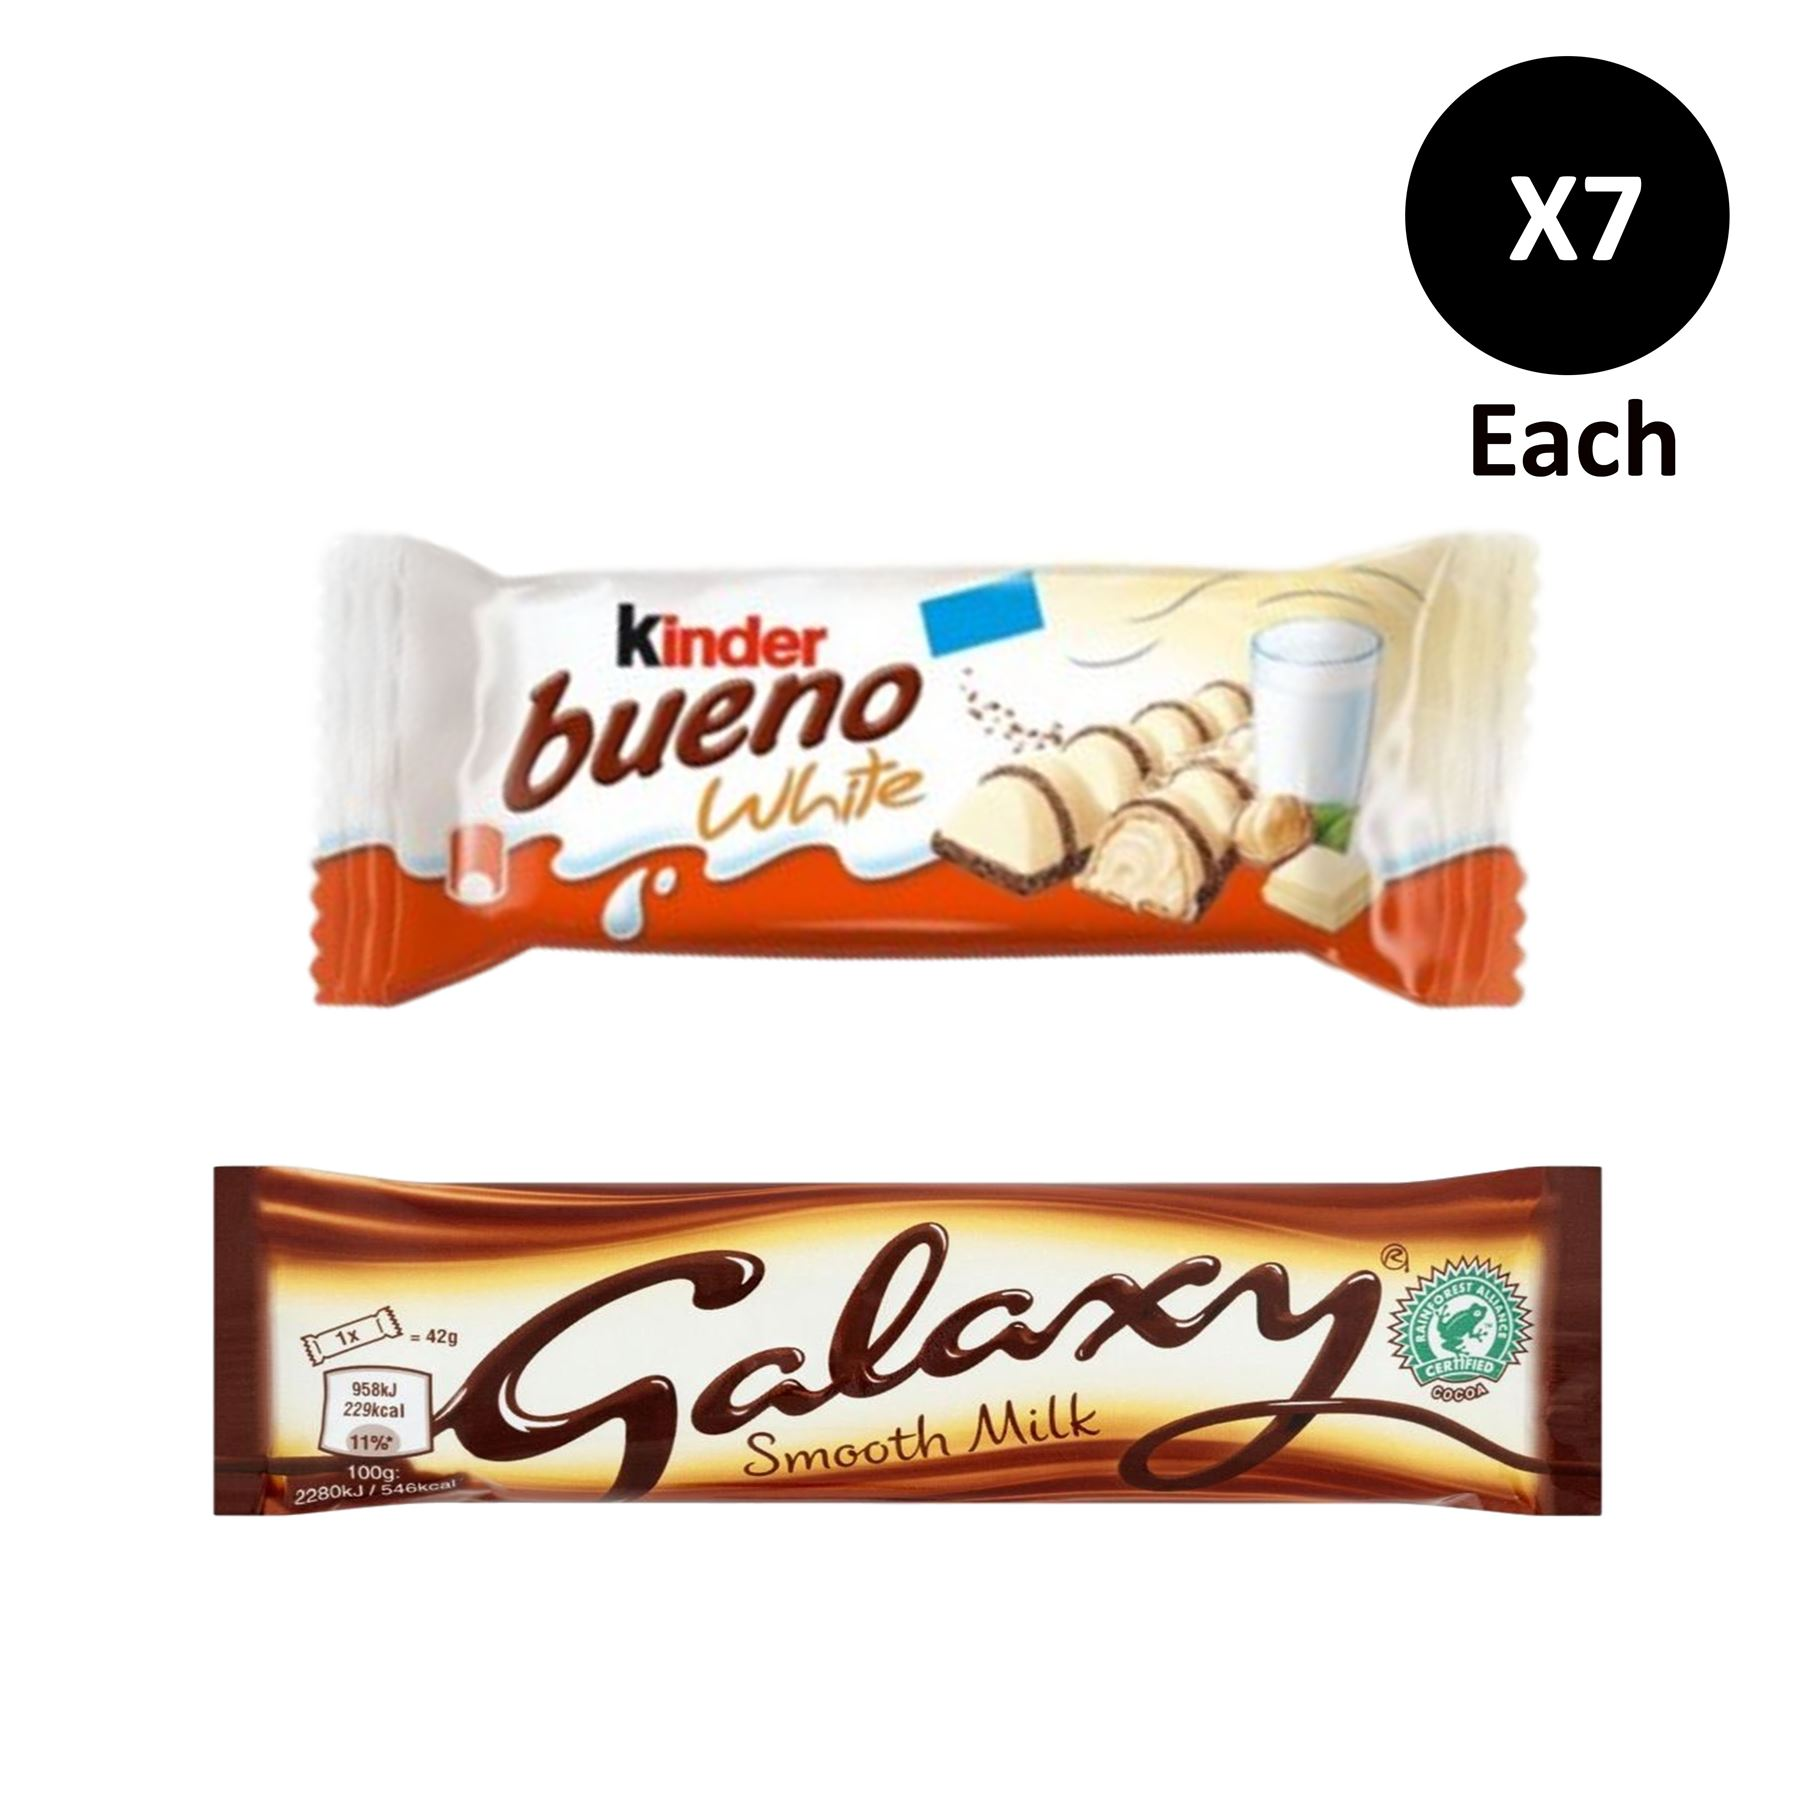 Details About Kinder Bueno White Chocolate Bar 7 X39g Galaxy Bars 7 X42g